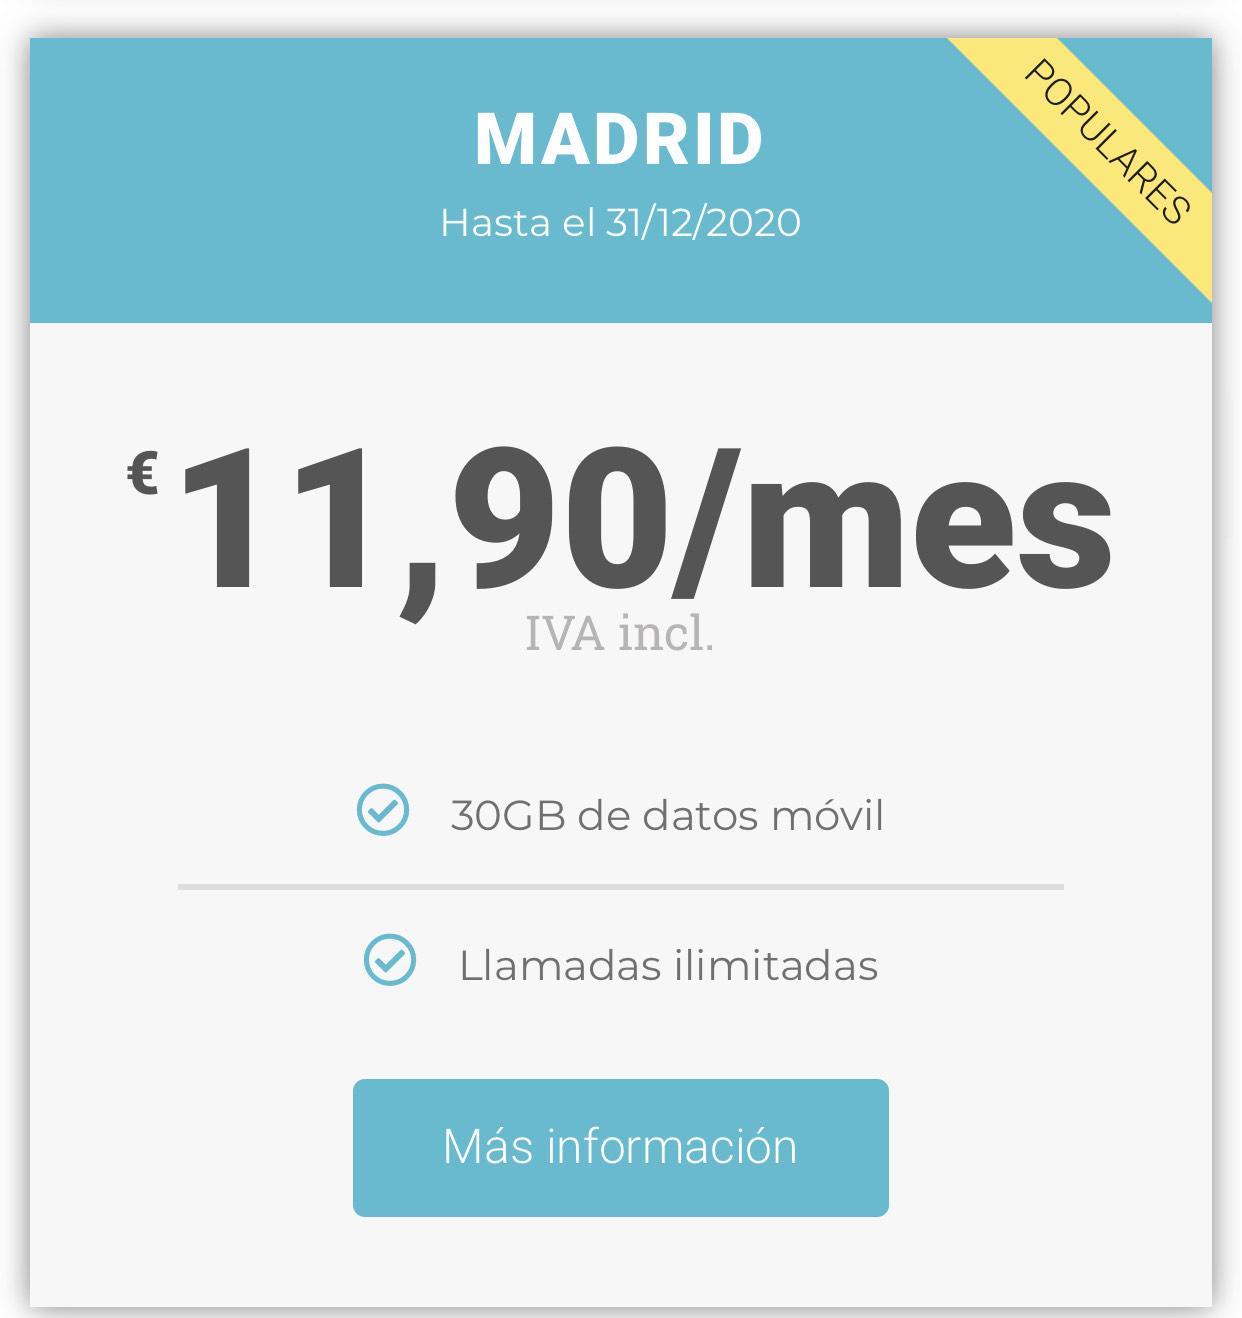 Tarifa móvil 30Gb + Ilimitadas - WIFIB